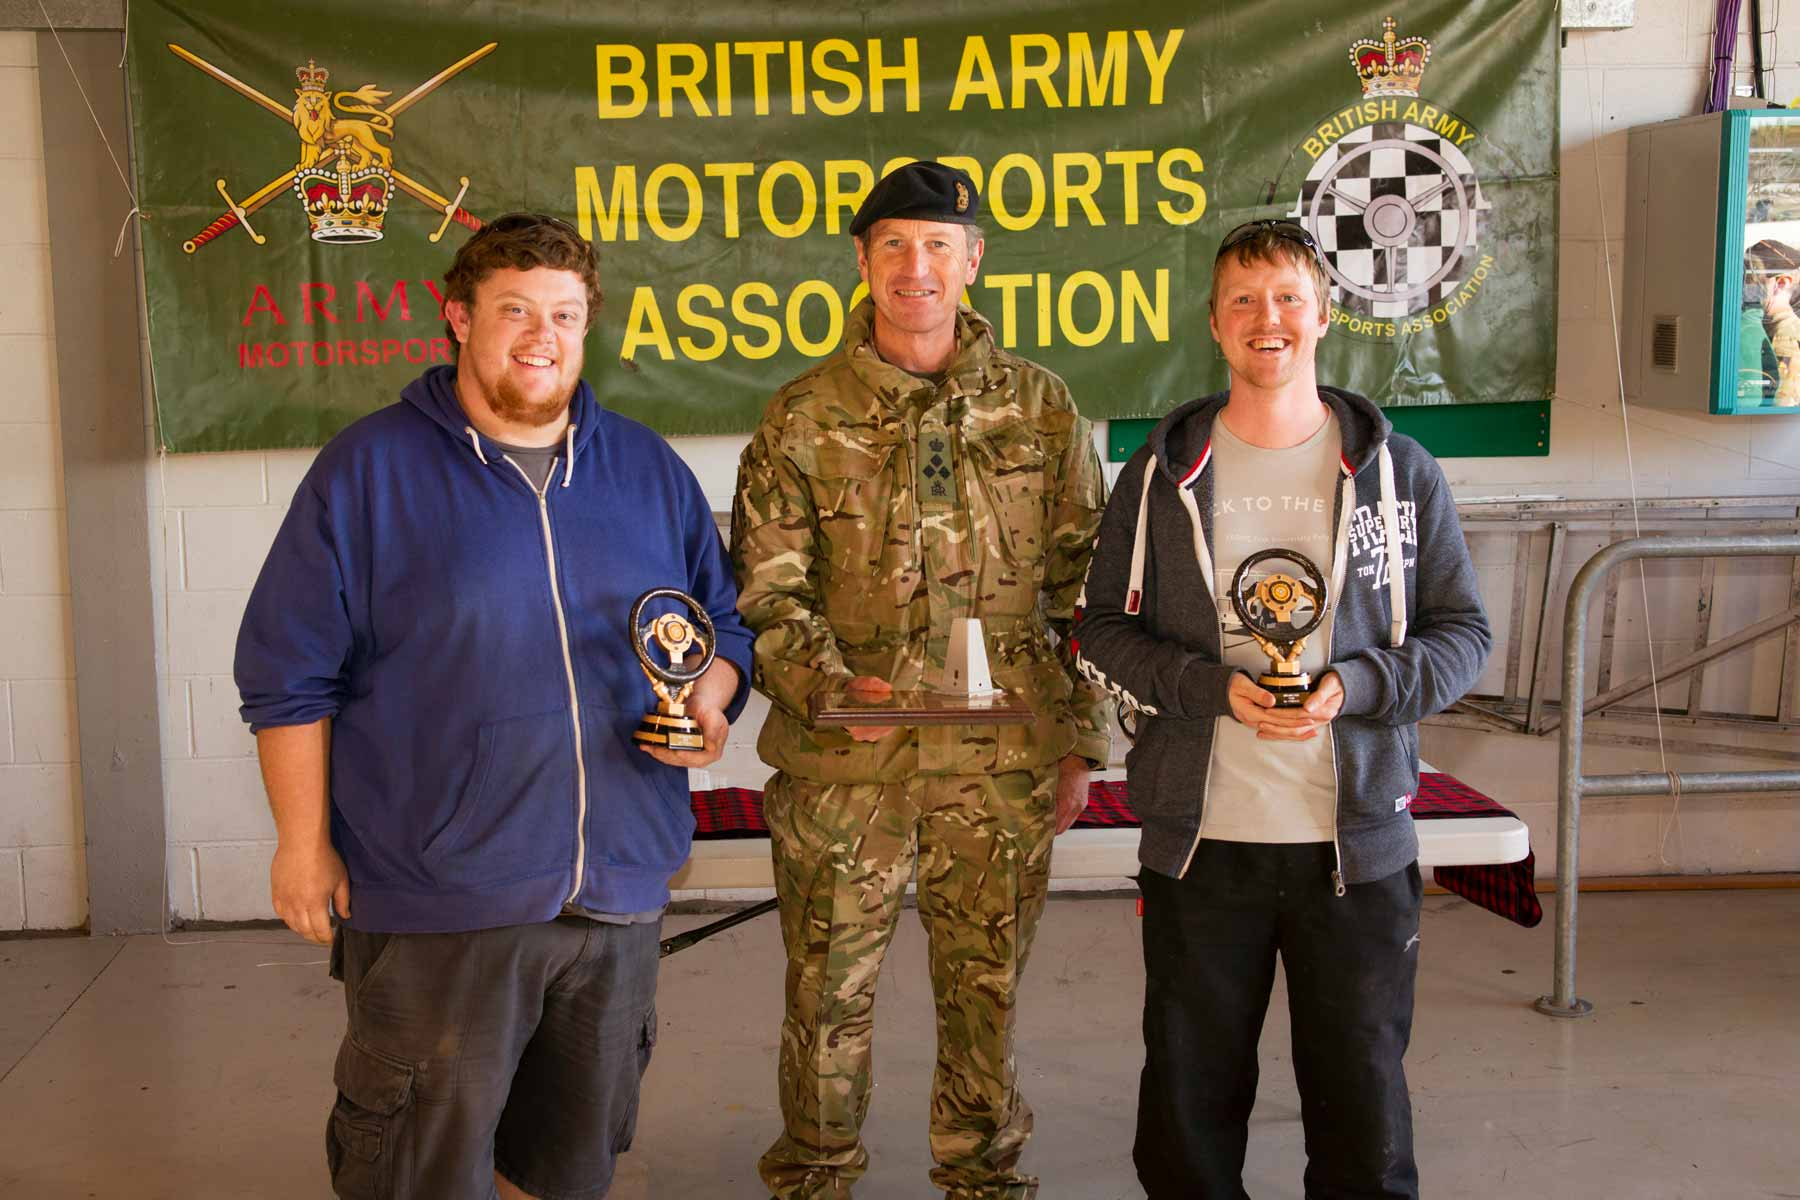 Winners Kevin Fulton and Alan Morrison